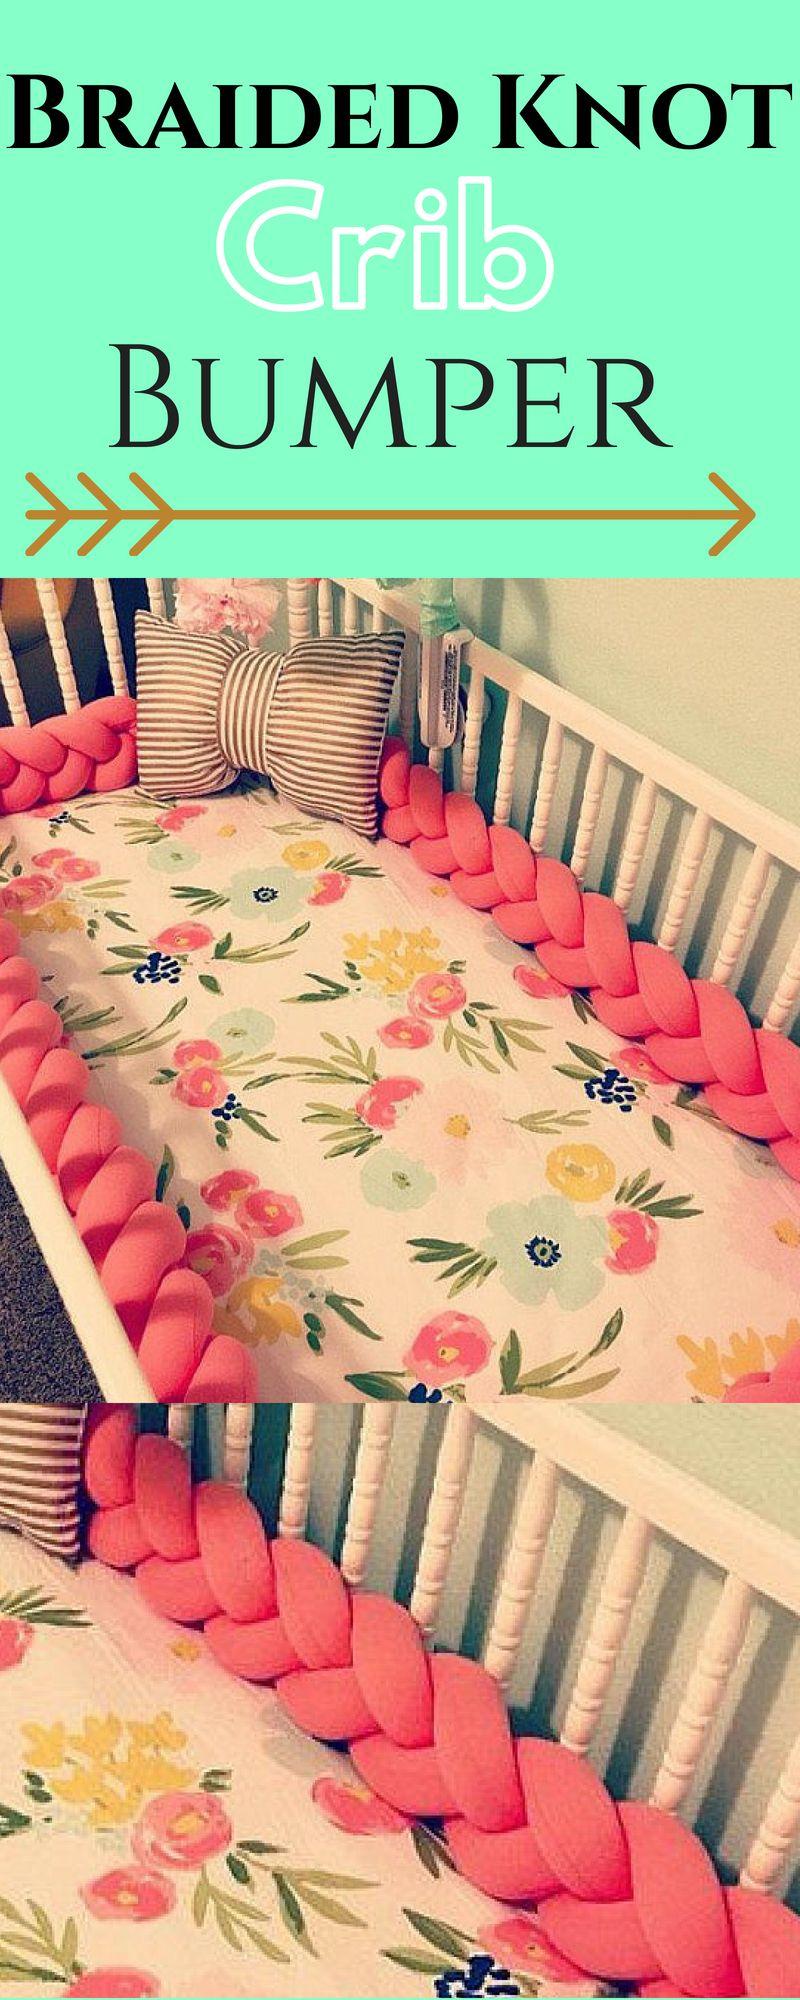 Braided crib bumper knot pillow knot cushion decorative pillow